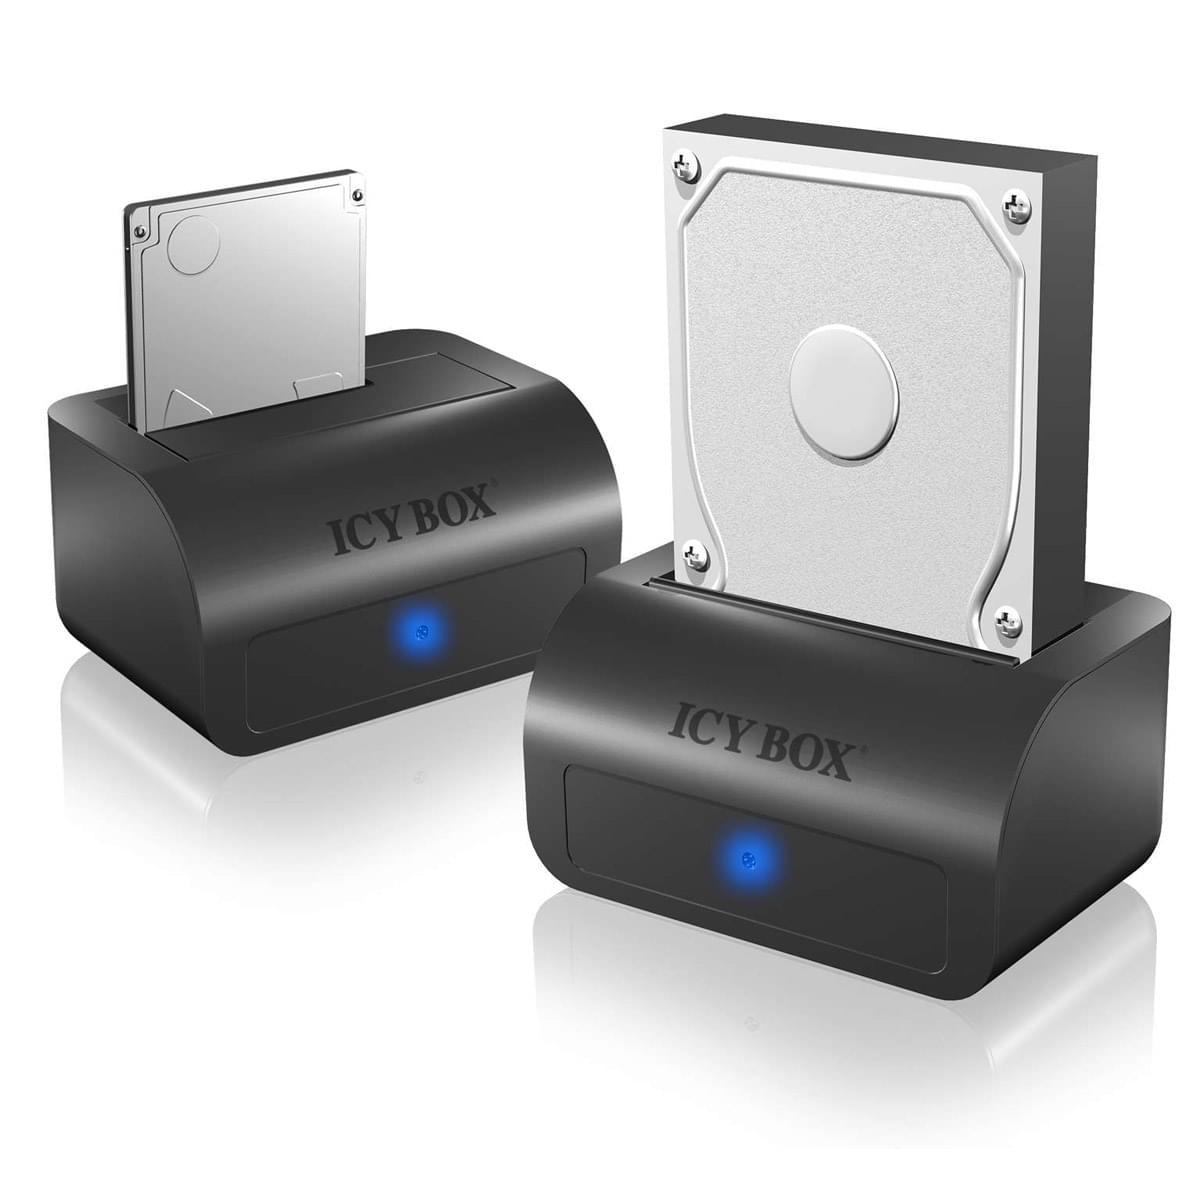 Icy Box Station d'accueil USB3 pour DD SATA- IB-116STU3-B (IB-116STU3-B) - Achat / Vente Boîtier externe sur Cybertek.fr - 0